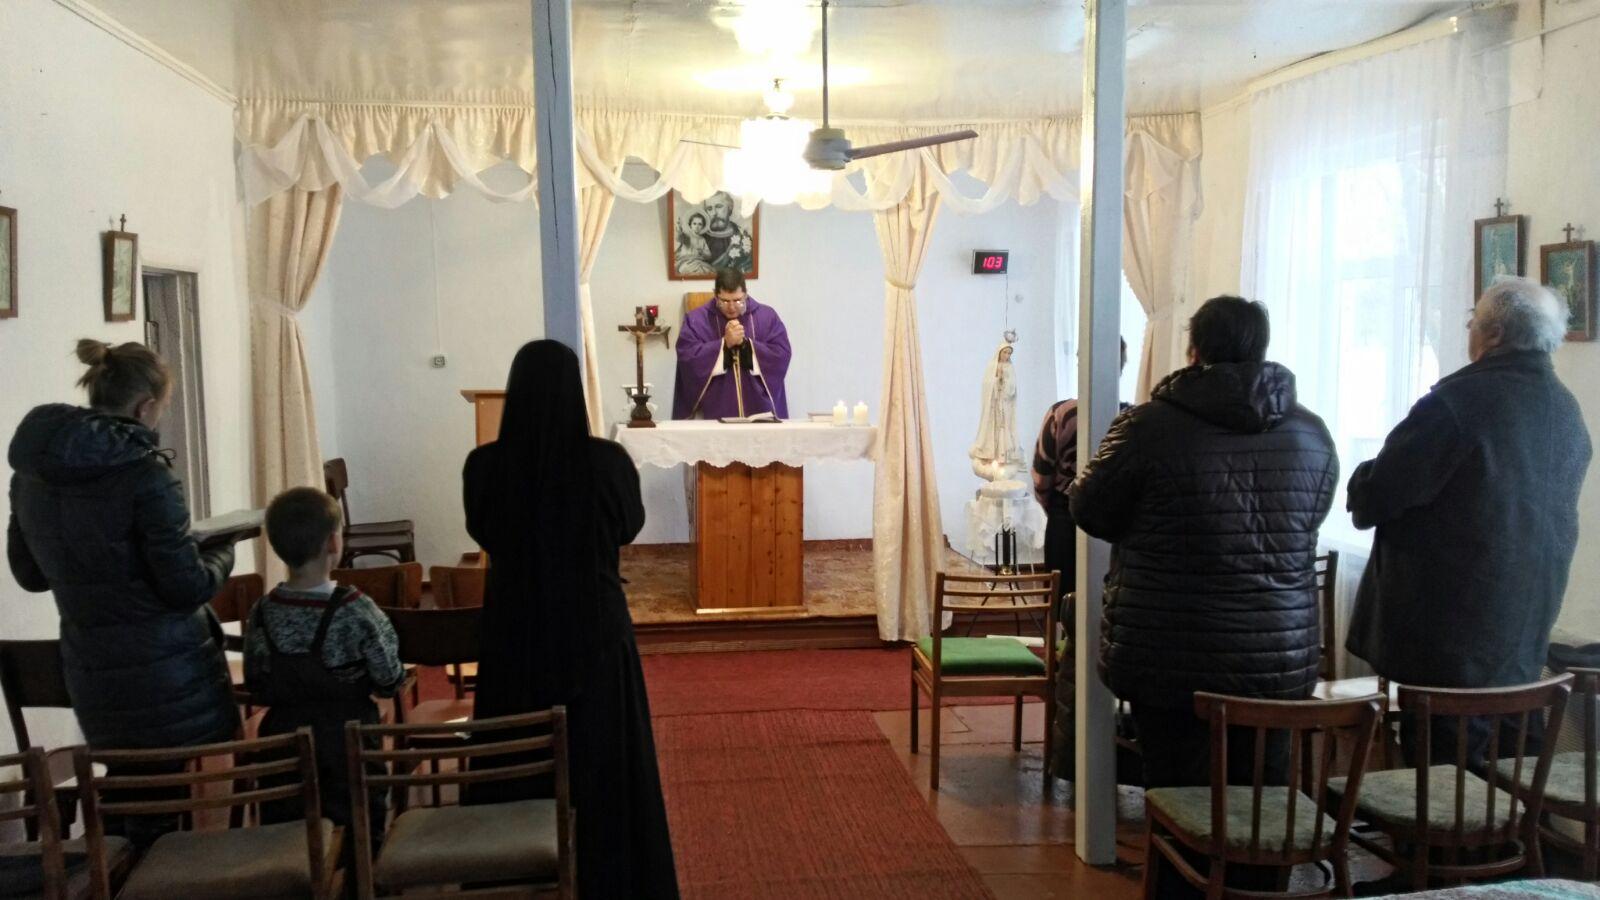 Servidoras Misión en Omsk, Rusia